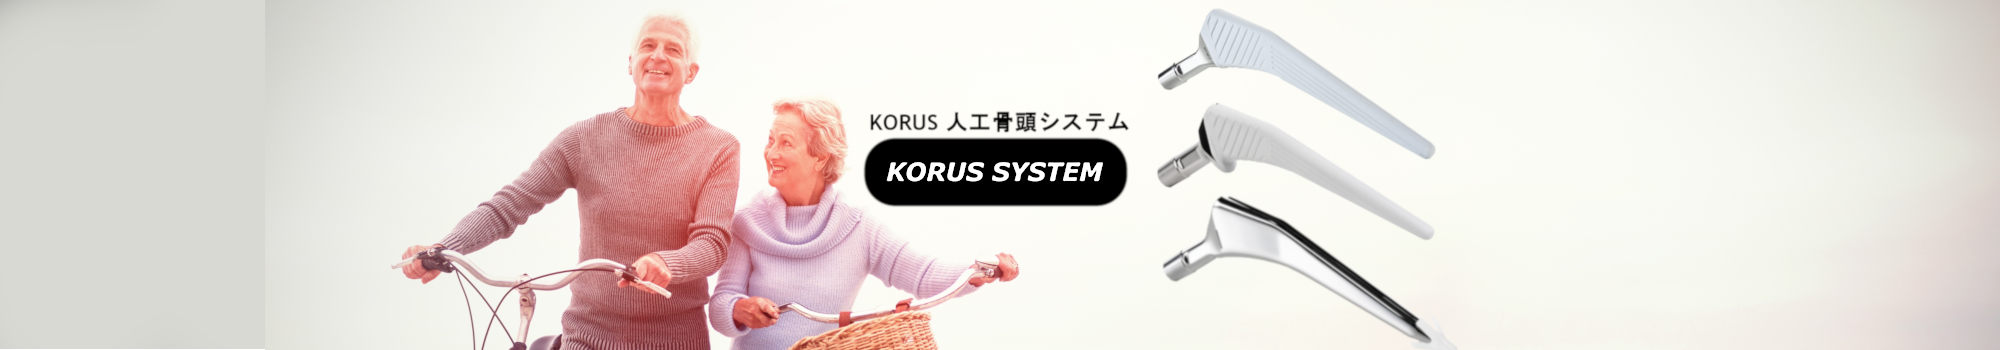 GB KORUS SYSTEM